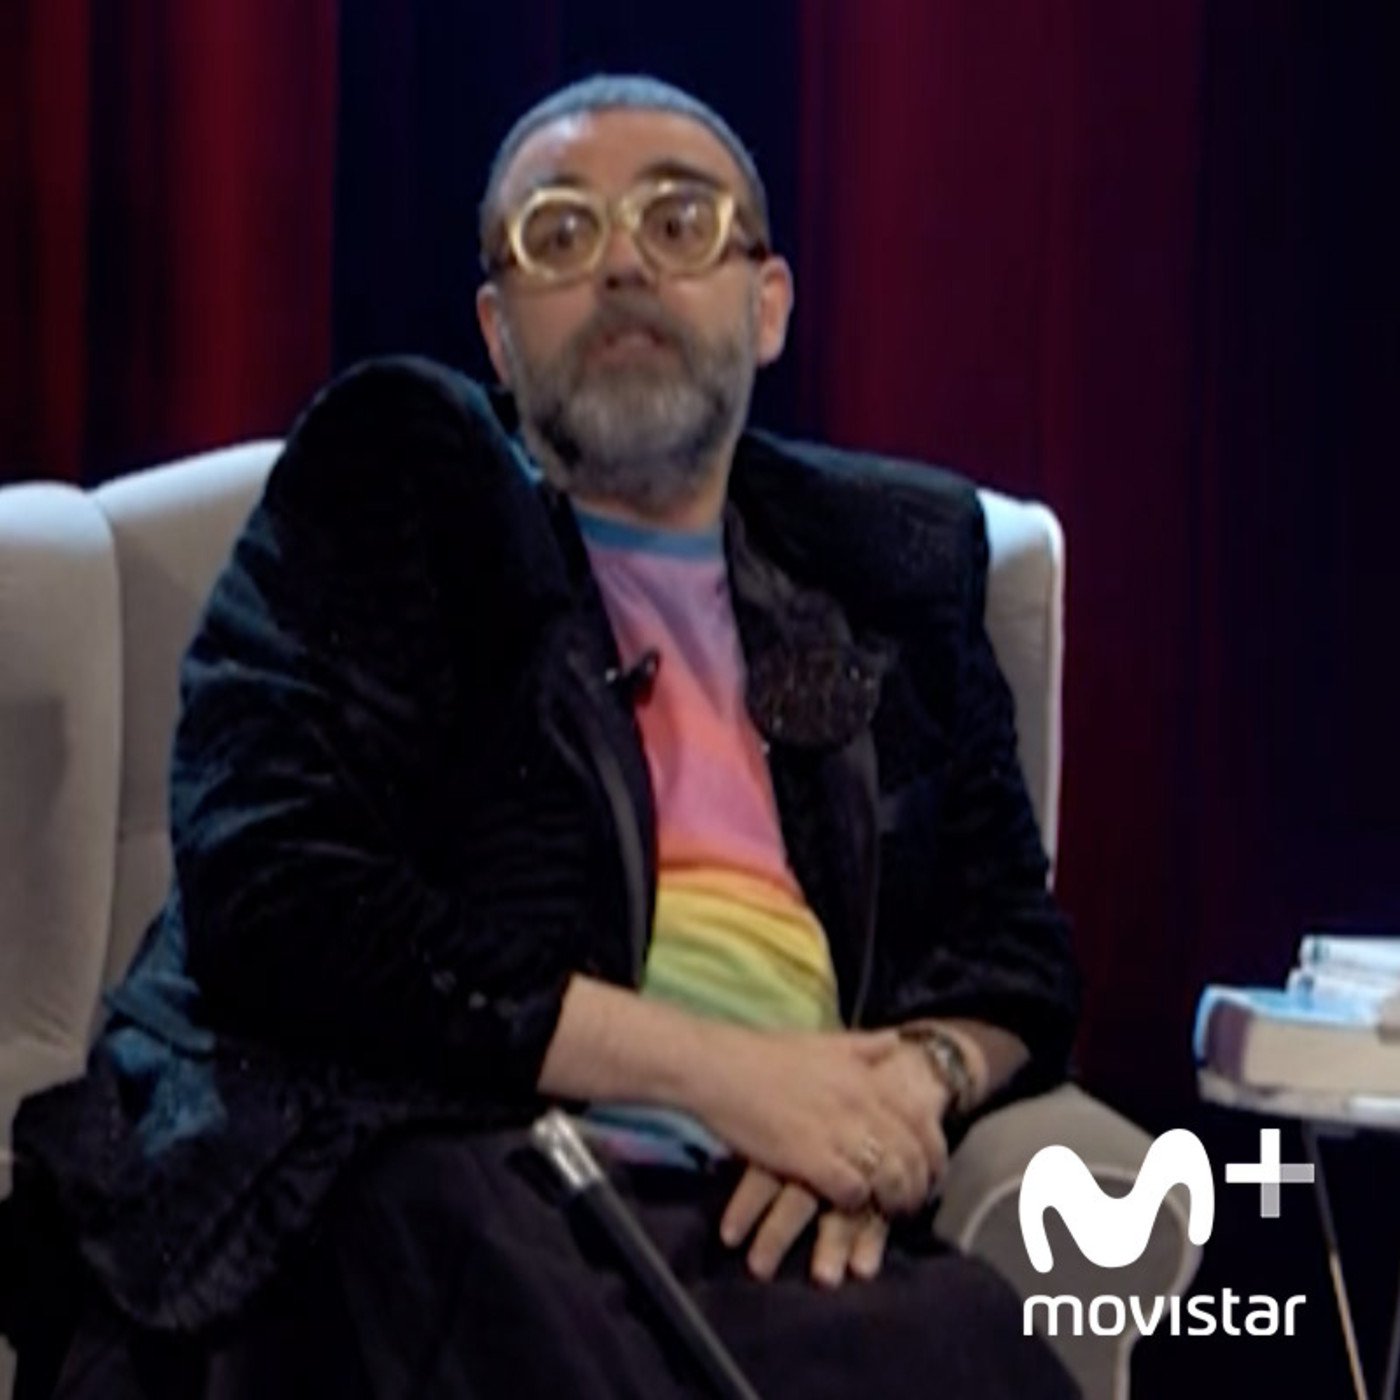 LATE MOTIV 578 - Monólogo de Bob Pop